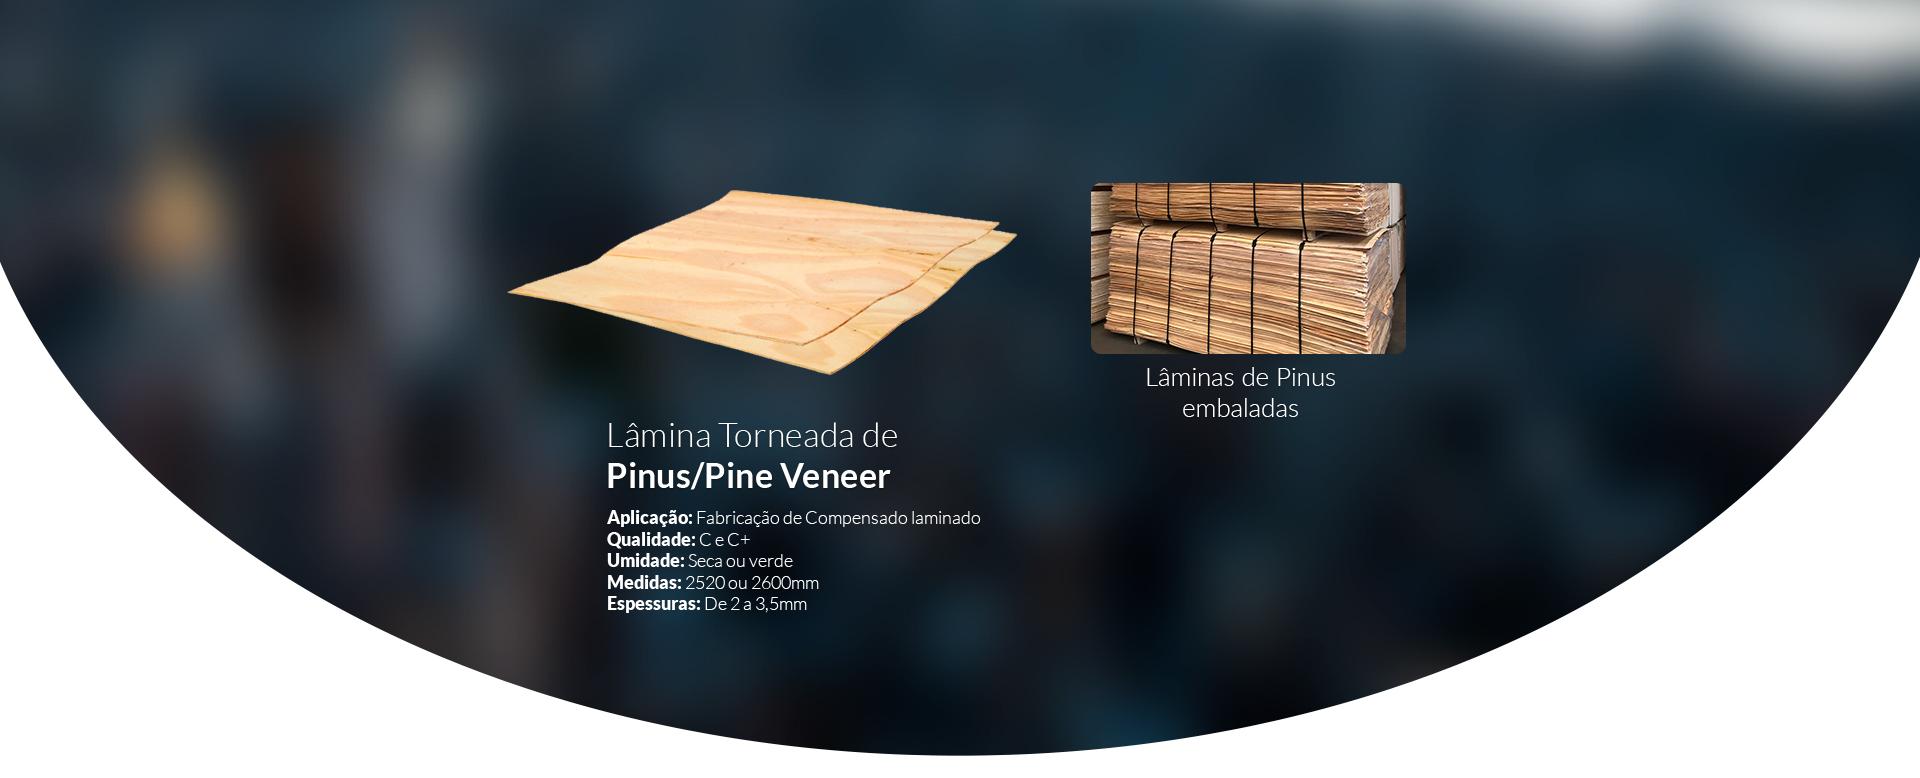 Lâmina Torneada de Pinus/Pine Veneer